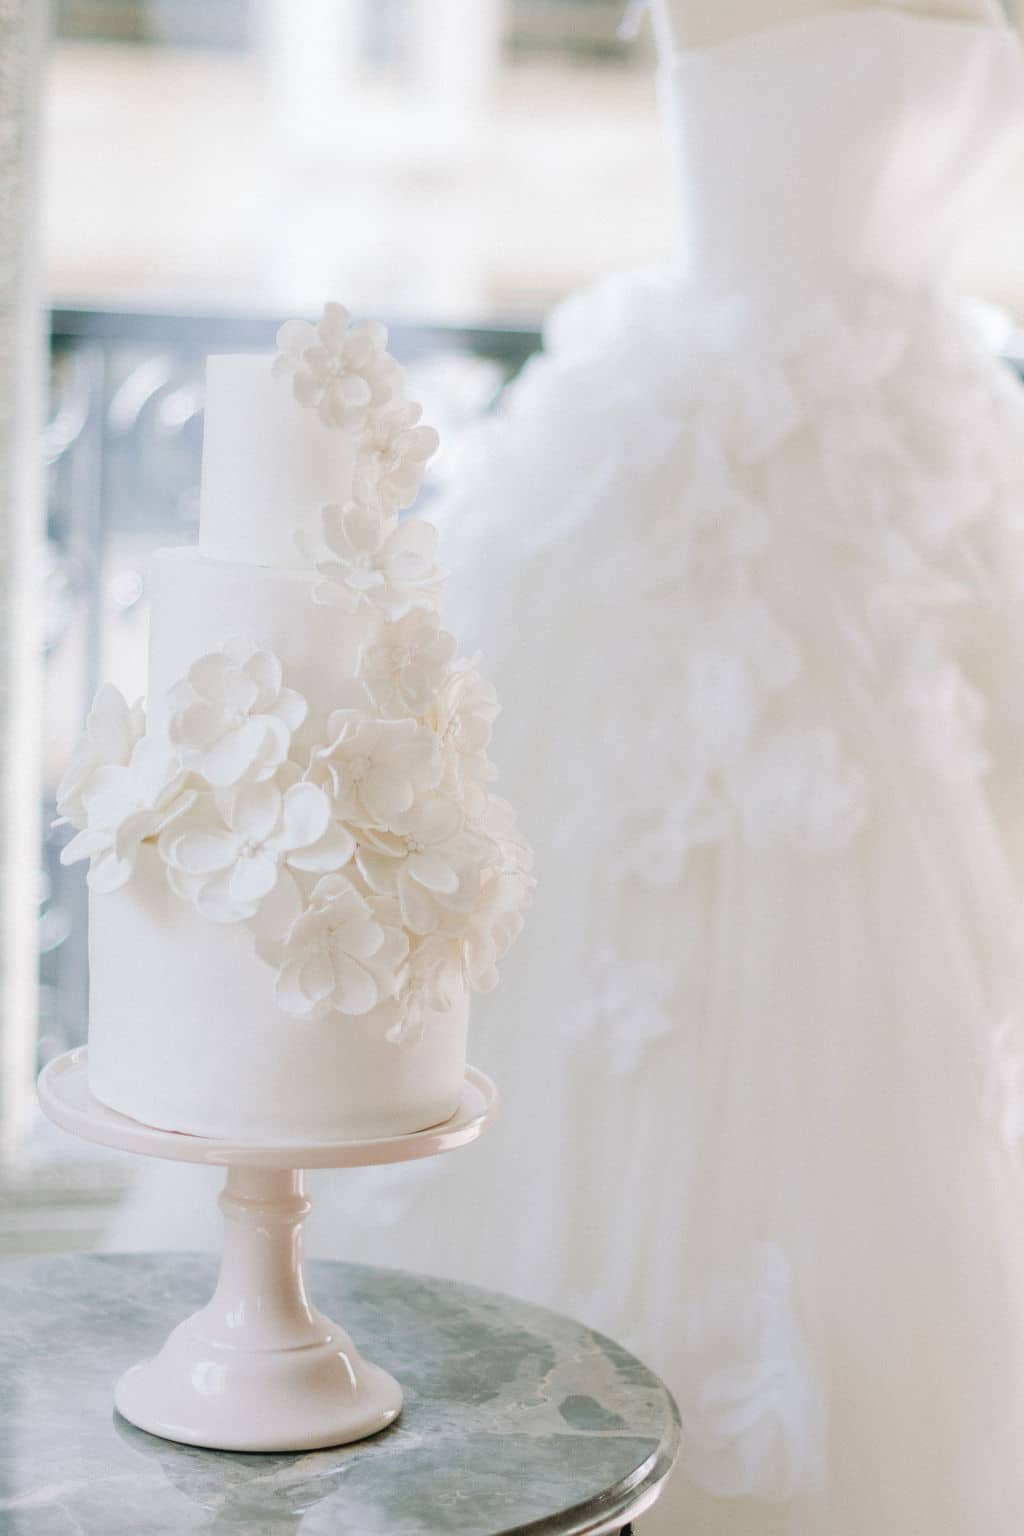 wedding cake blanc volupteux avec es fleurs blanches